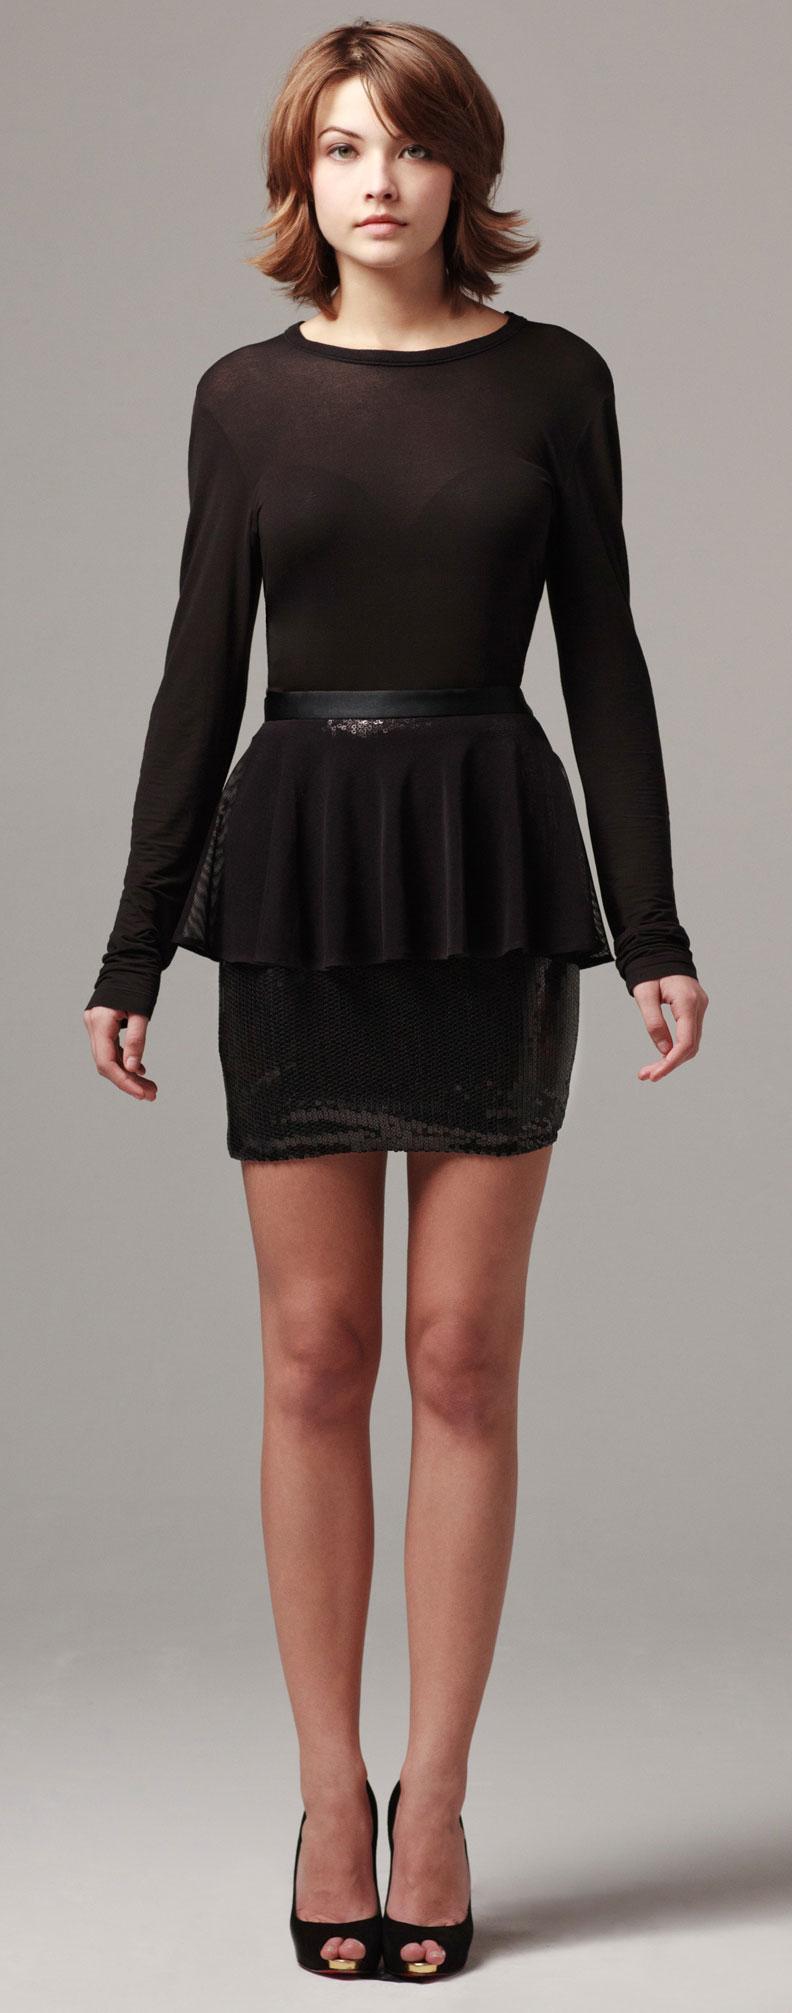 Z-Form-Uniform-Kelsy-Zimba-Blouse-CH1-Skirt-CS2.jpg